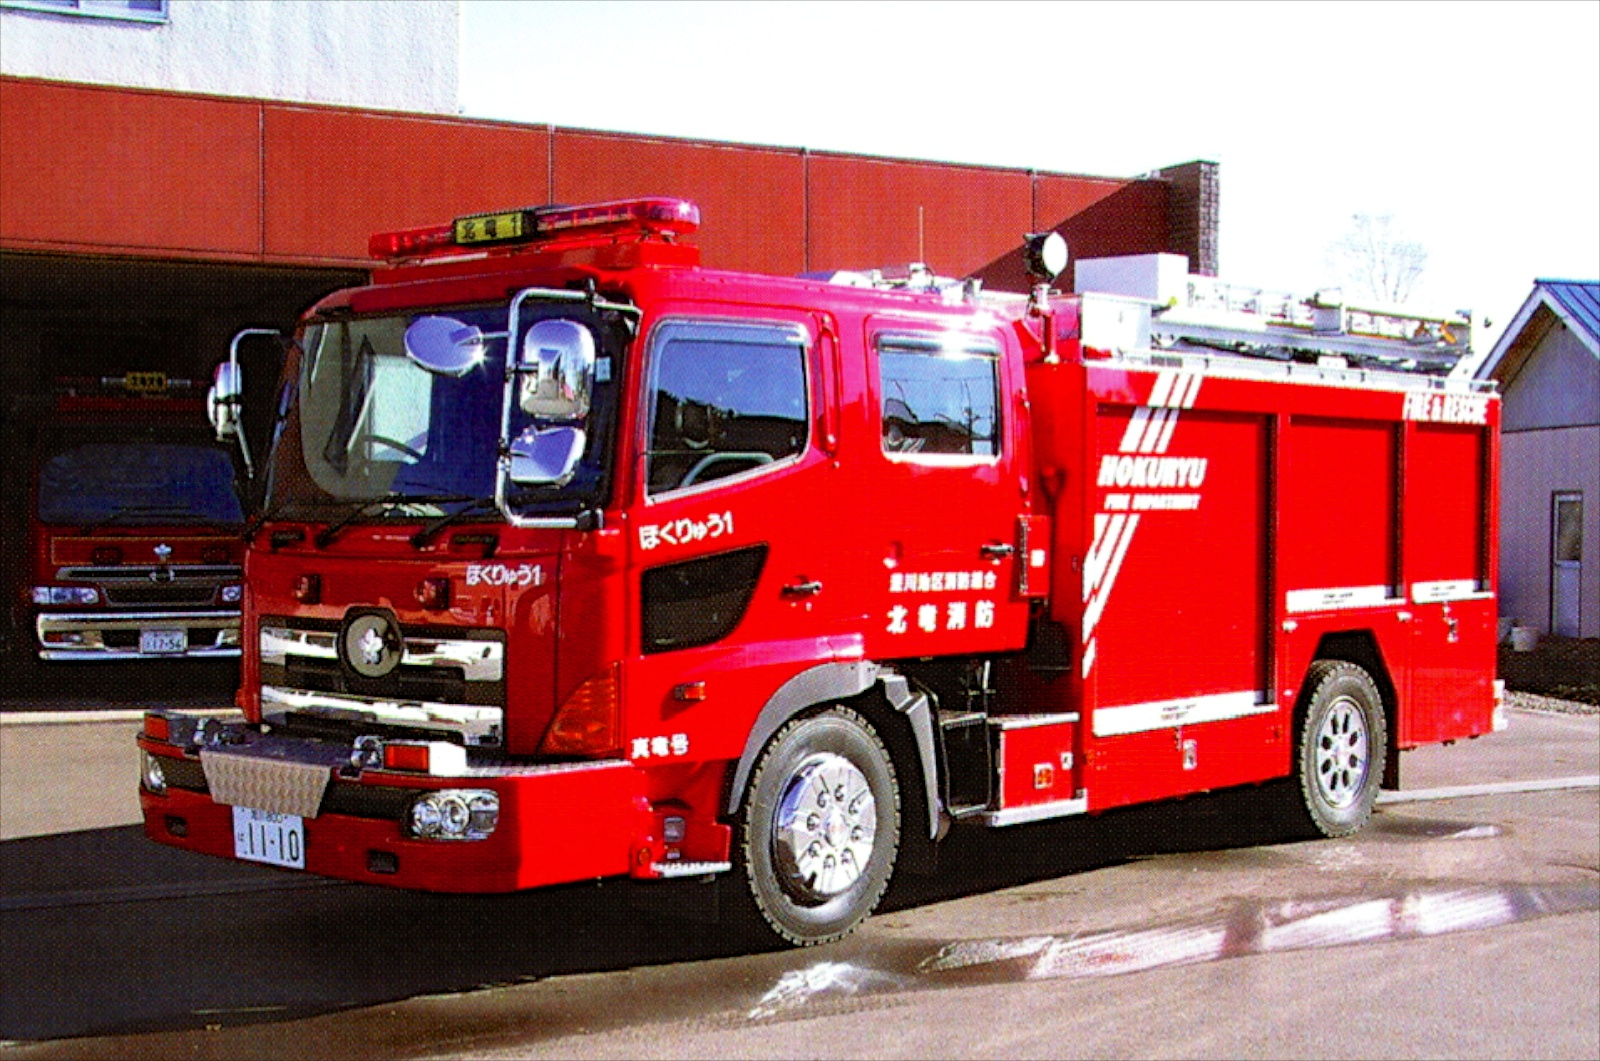 Photo: 水槽付消防ポンプ自動車「真竜号」 水 3,000リットル積載 救助資機材積載車